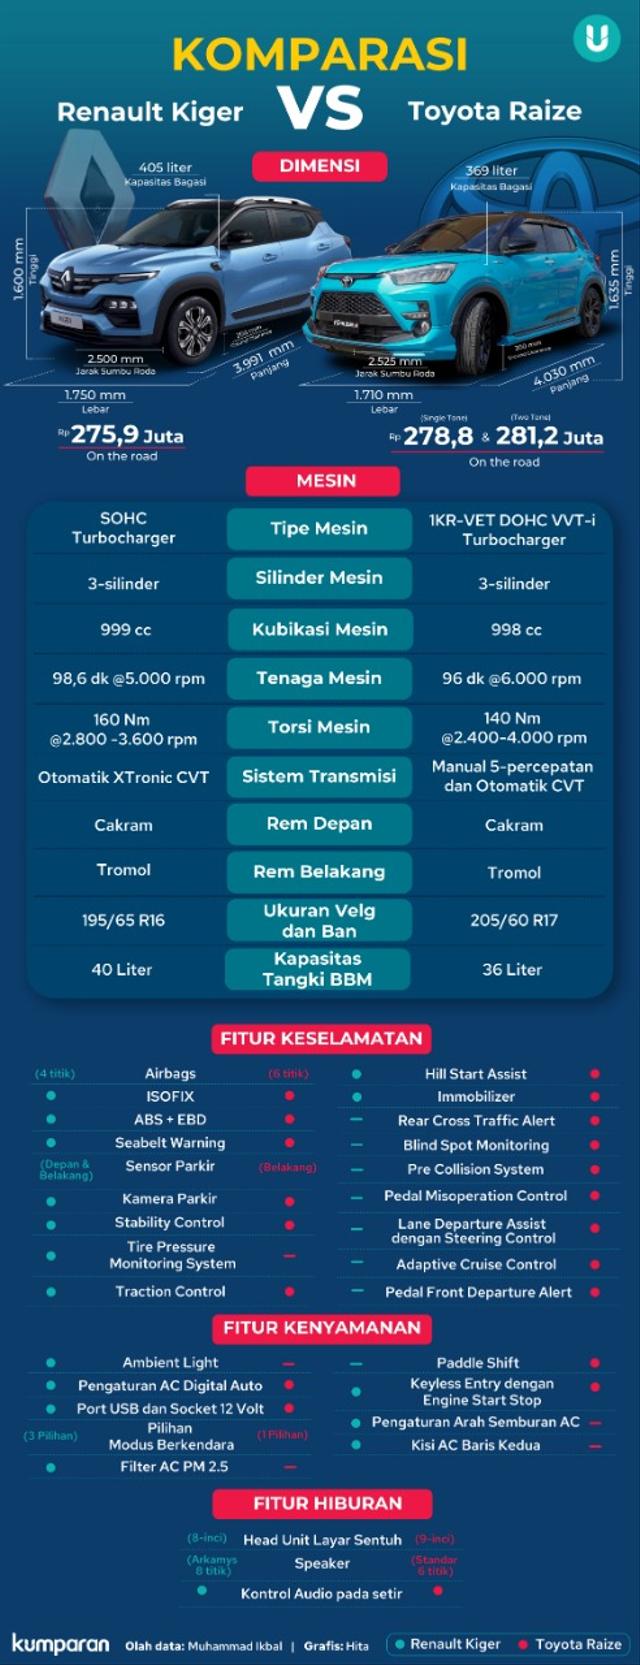 Infografik: Duel Renault Kiger vs Toyota Raize, Mana Lebih Unggul? (234304)